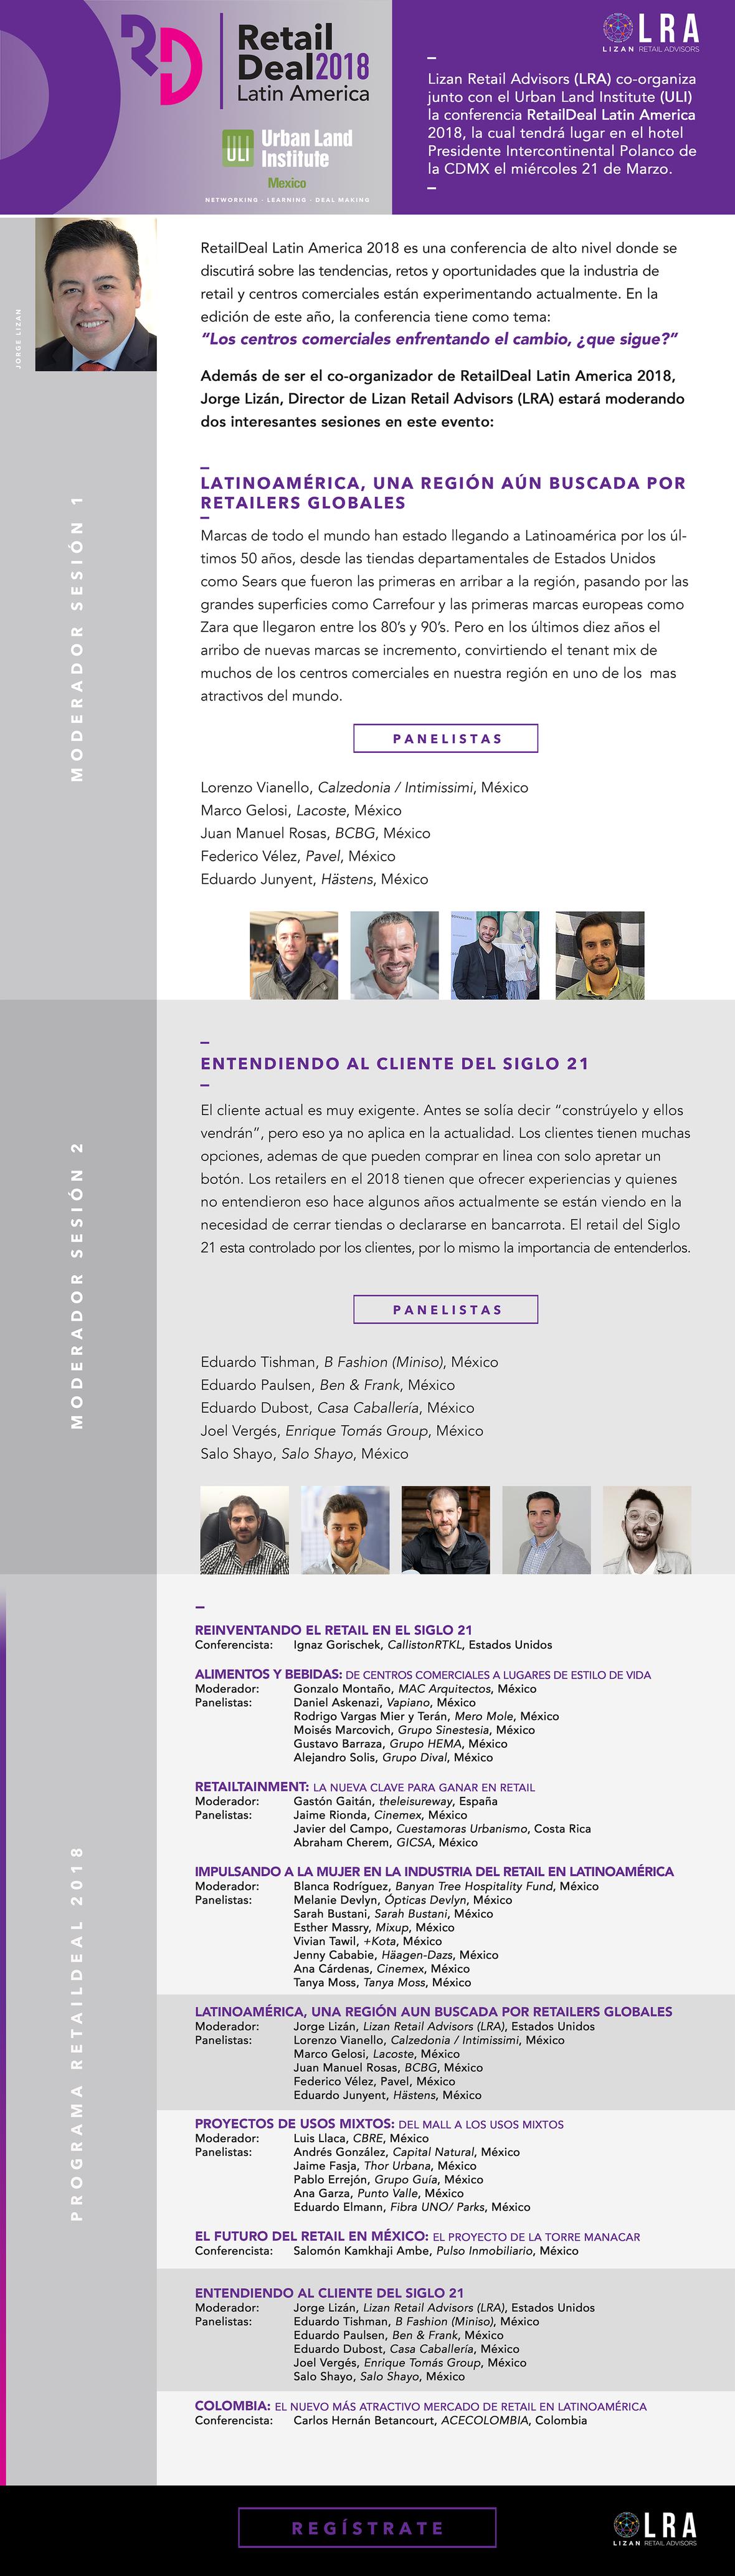 Lizan Retail Advisors LRA presente en The RetailDeal Latin America 2018